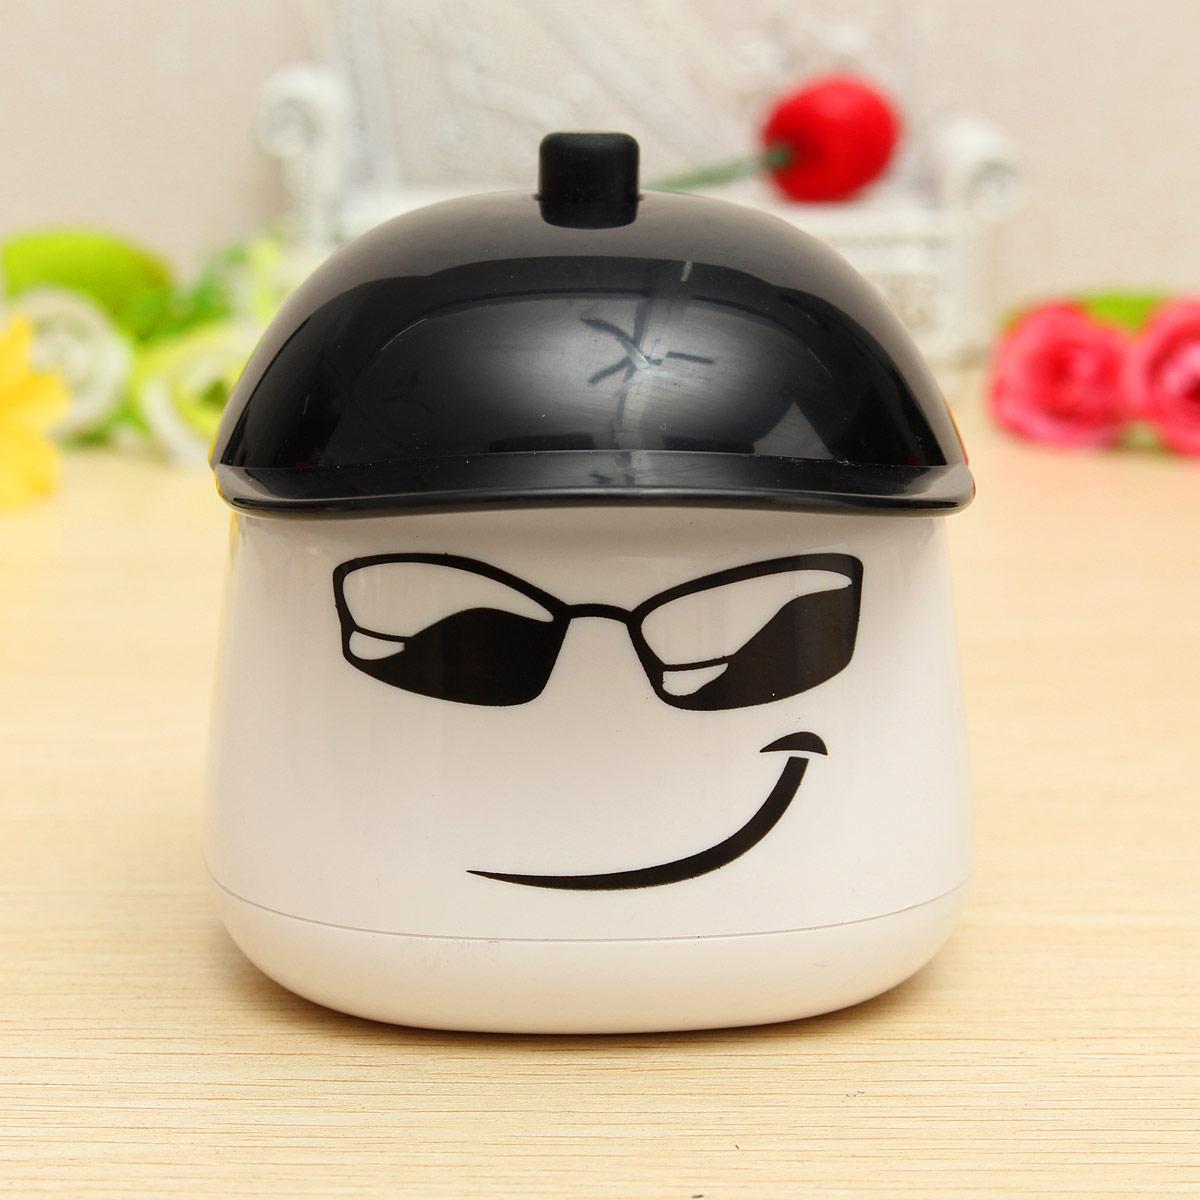 Home Office Car Auto Humidifier Filter Air Purifier (Black) (Intl #98B712